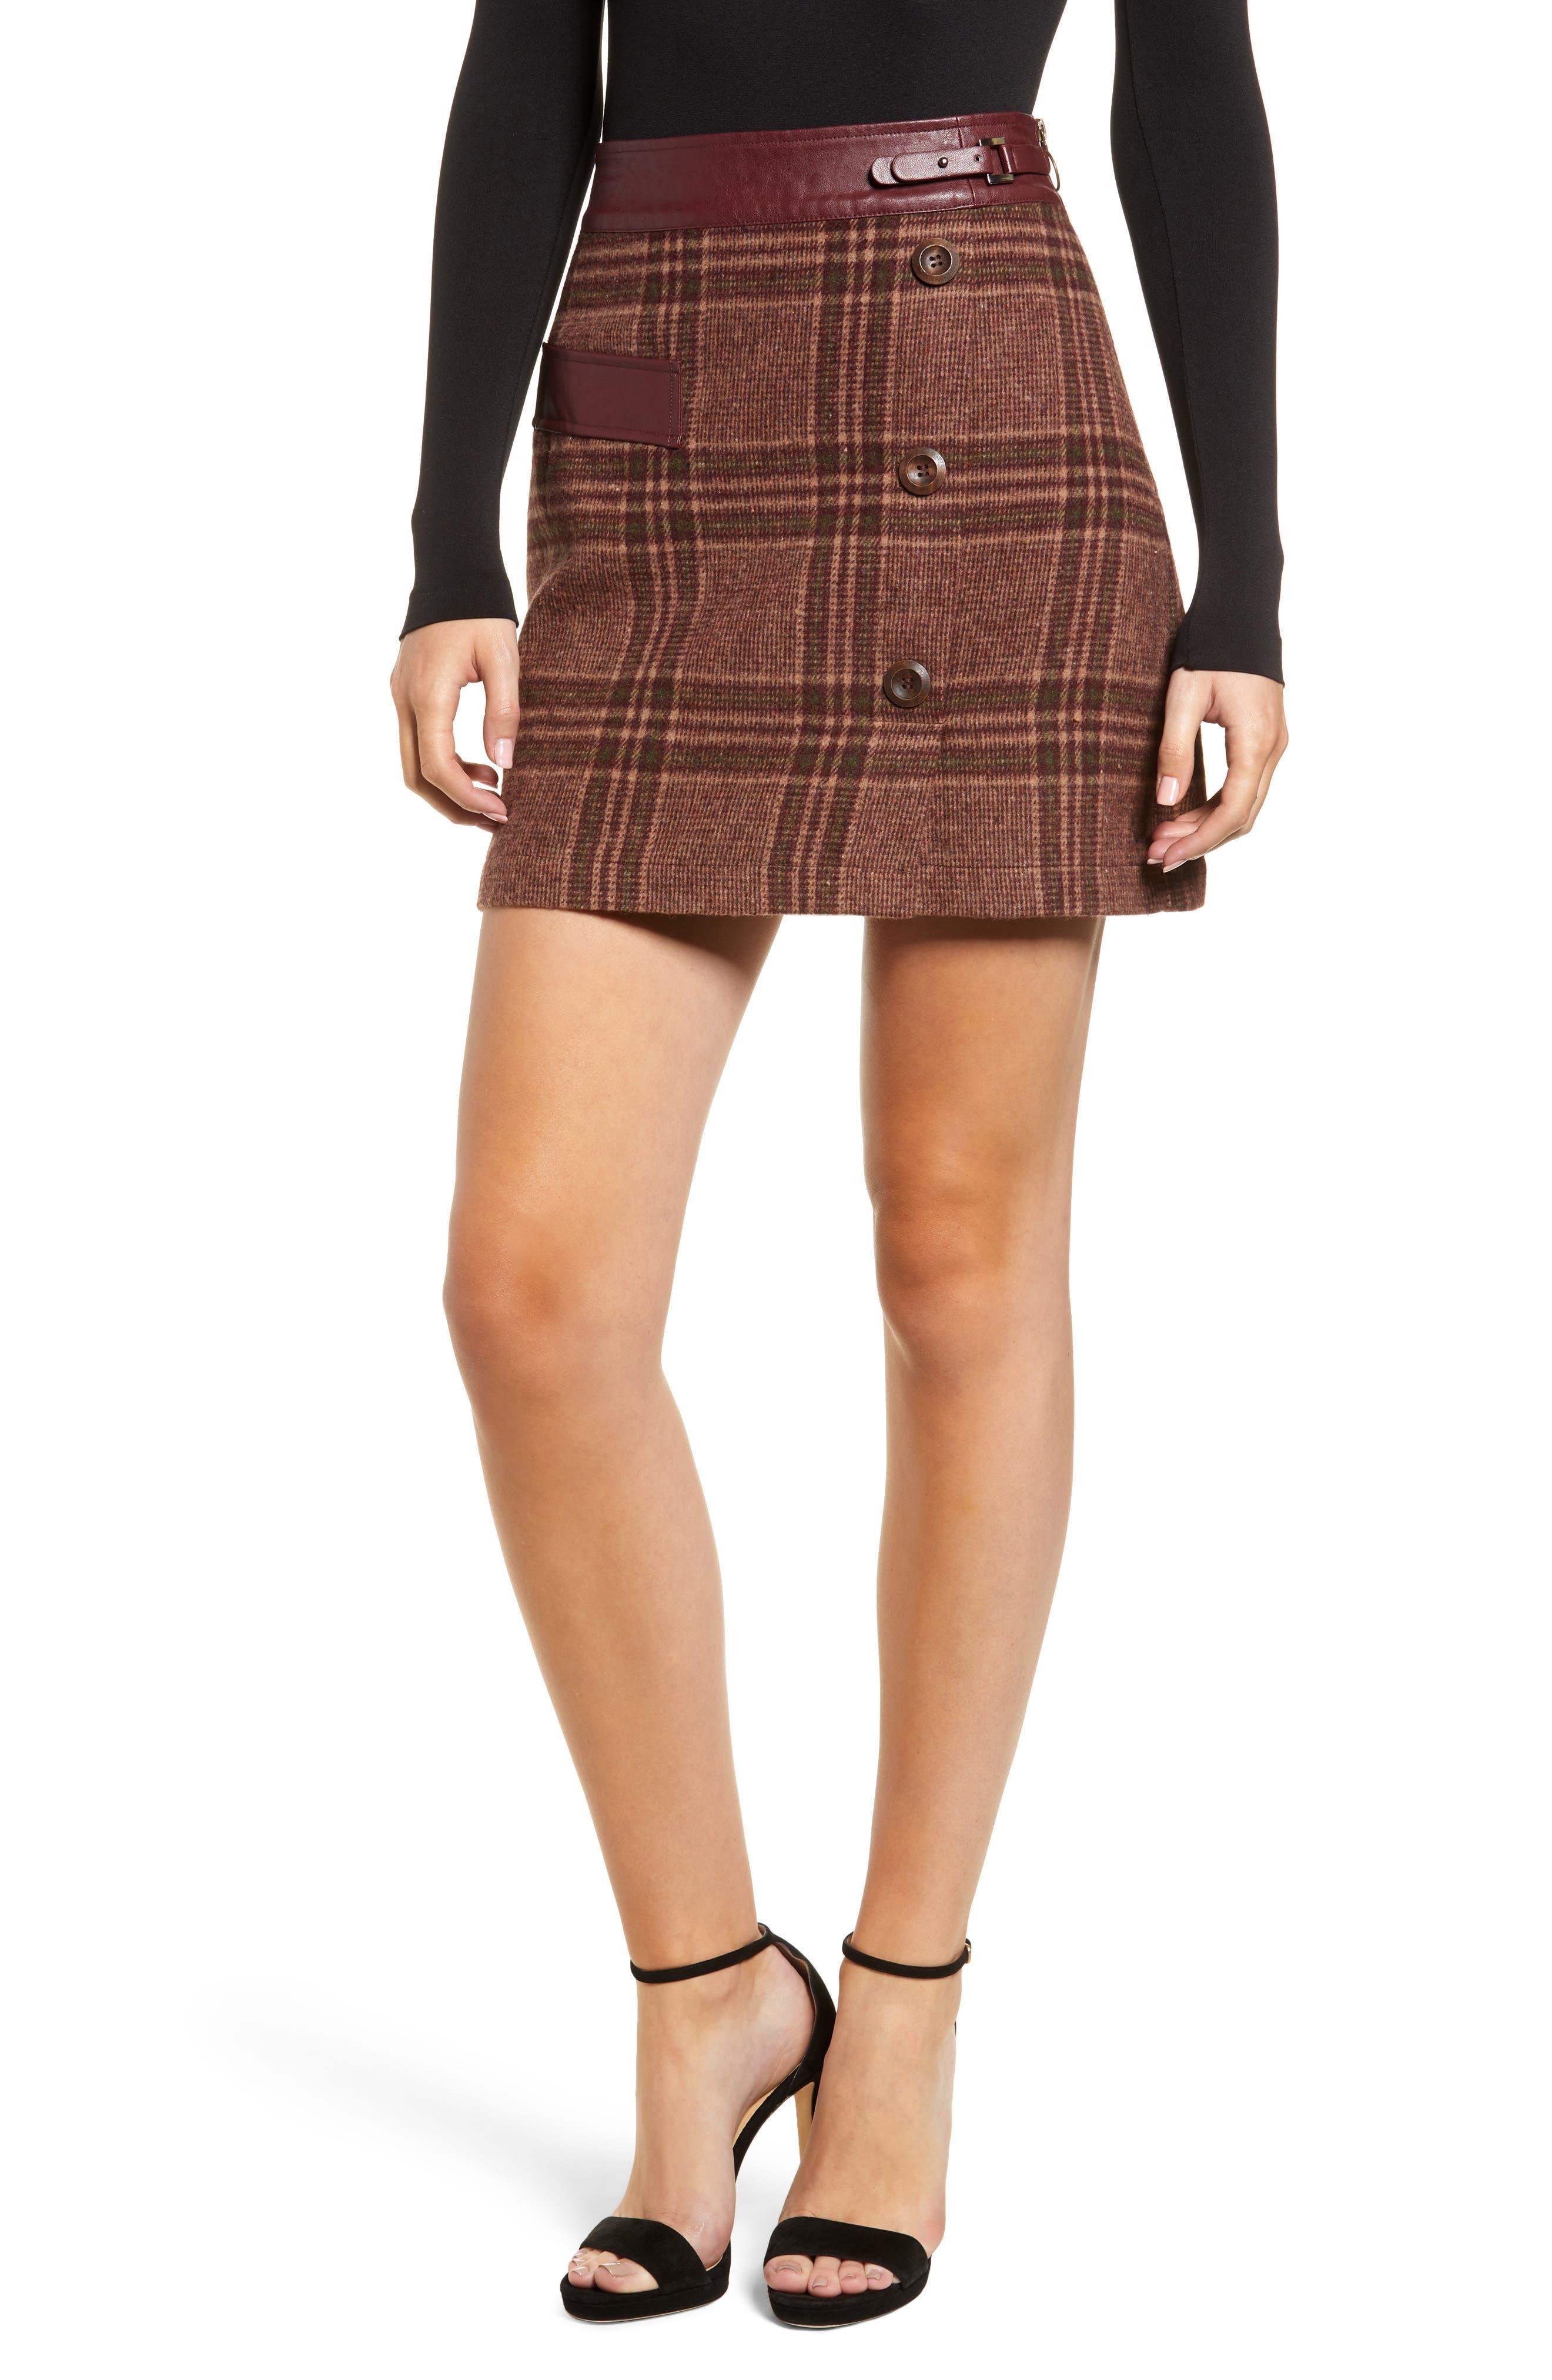 MOON RIVER Plaid Miniskirt, Main, color, 200